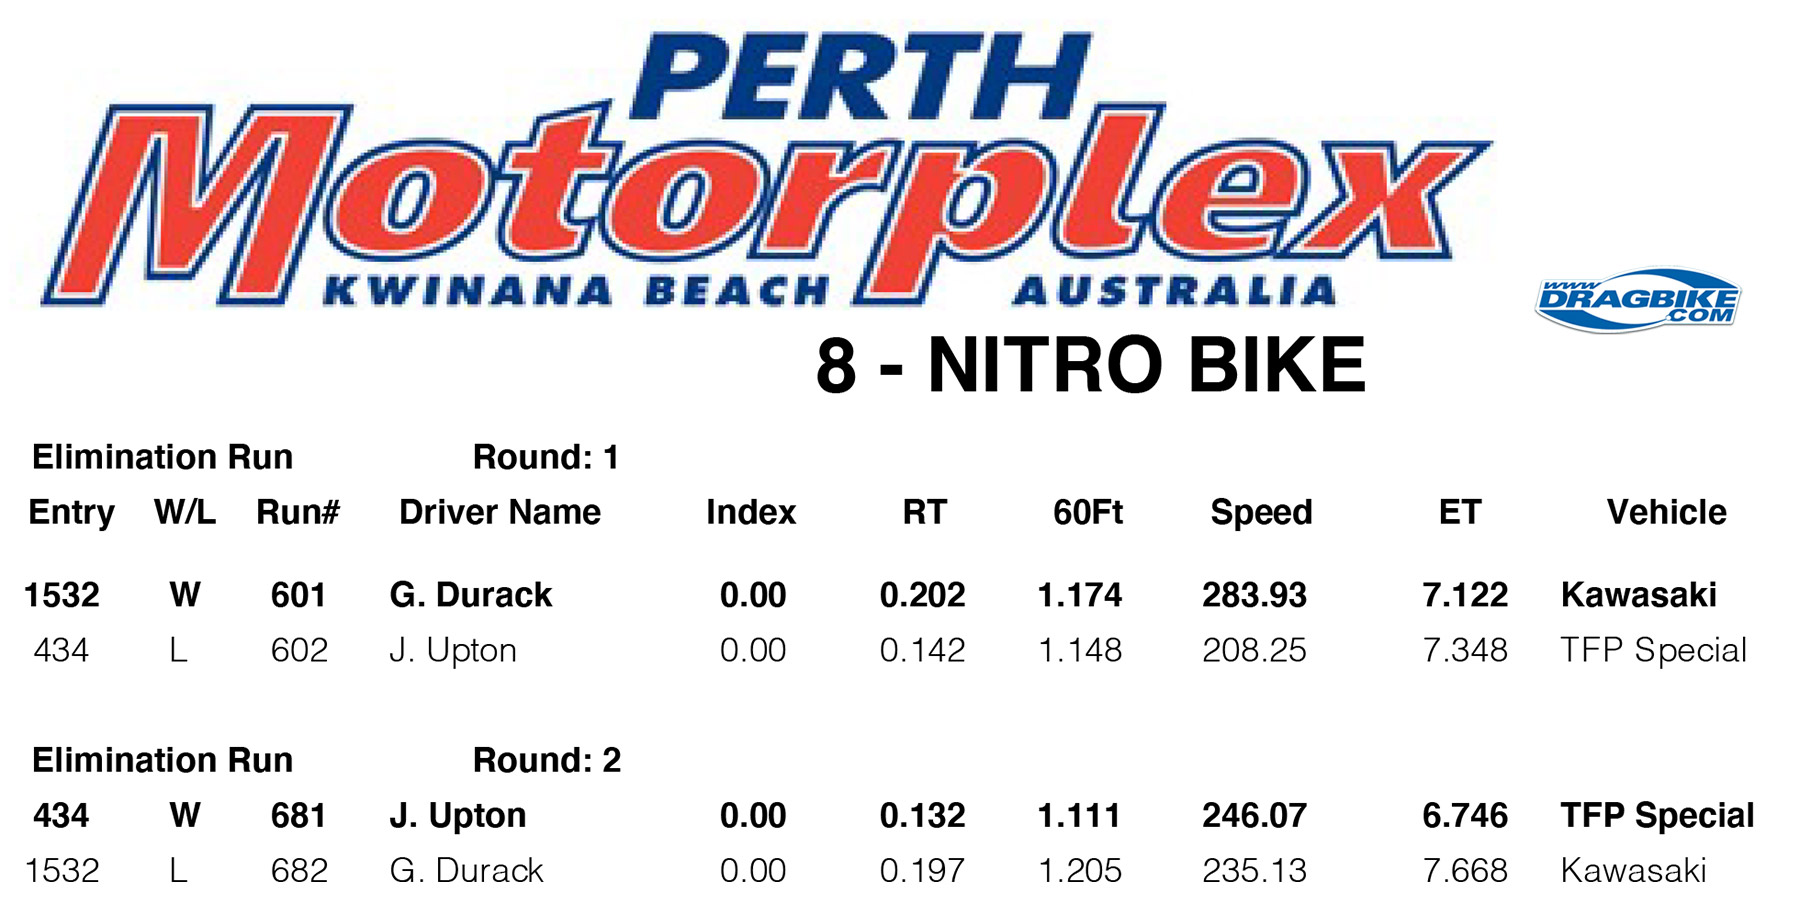 Perth Motorplex Nitro Bike